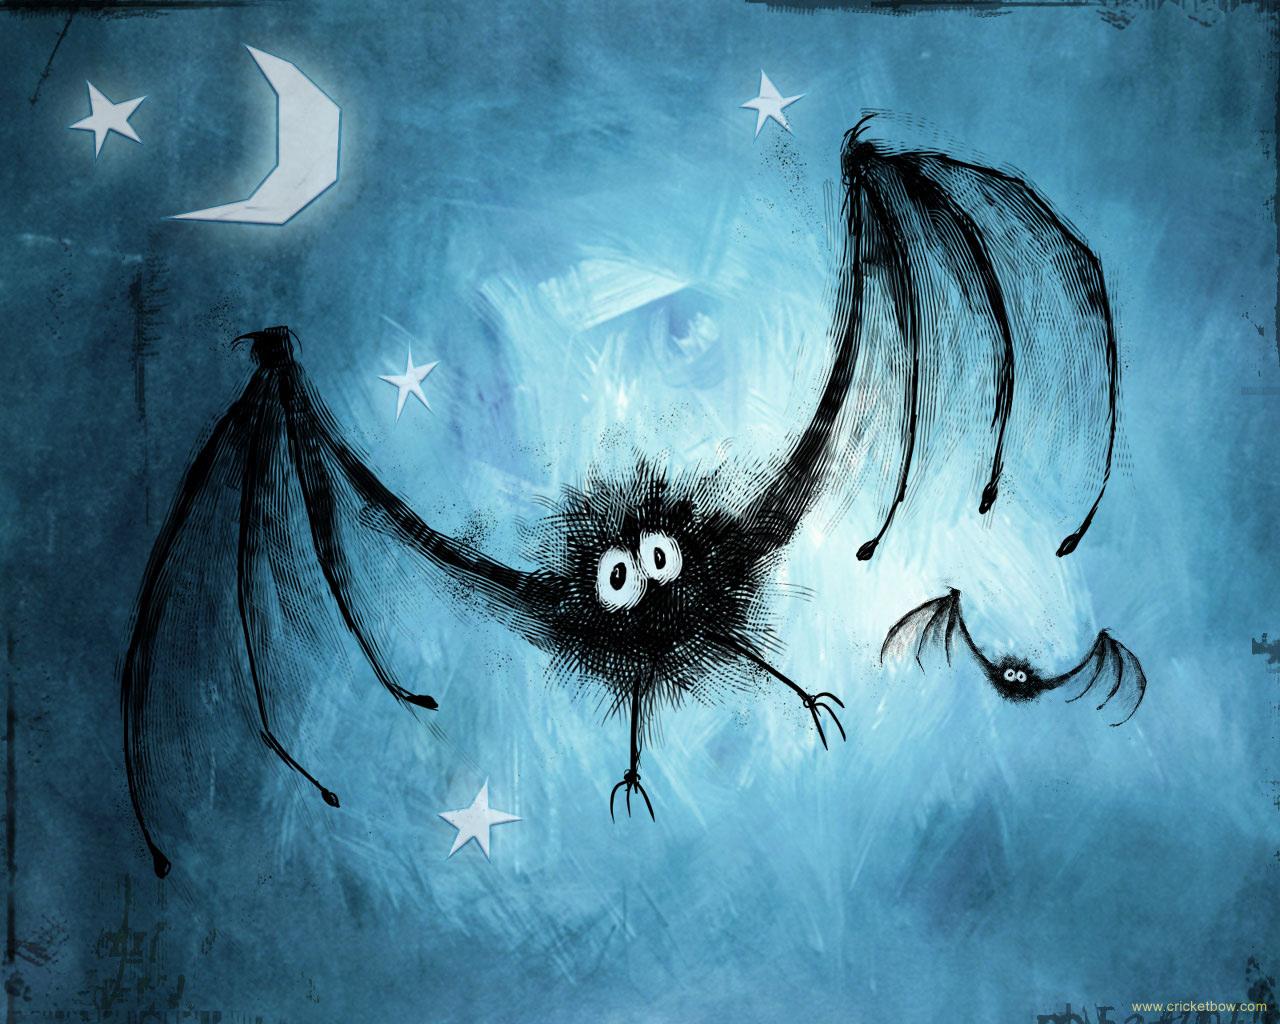 http://4.bp.blogspot.com/-eHEP_e6CzlA/TqbT-AjuuGI/AAAAAAAAAtk/MeSa-JnSD2Y/s1600/halloween-wallpapers.jpg